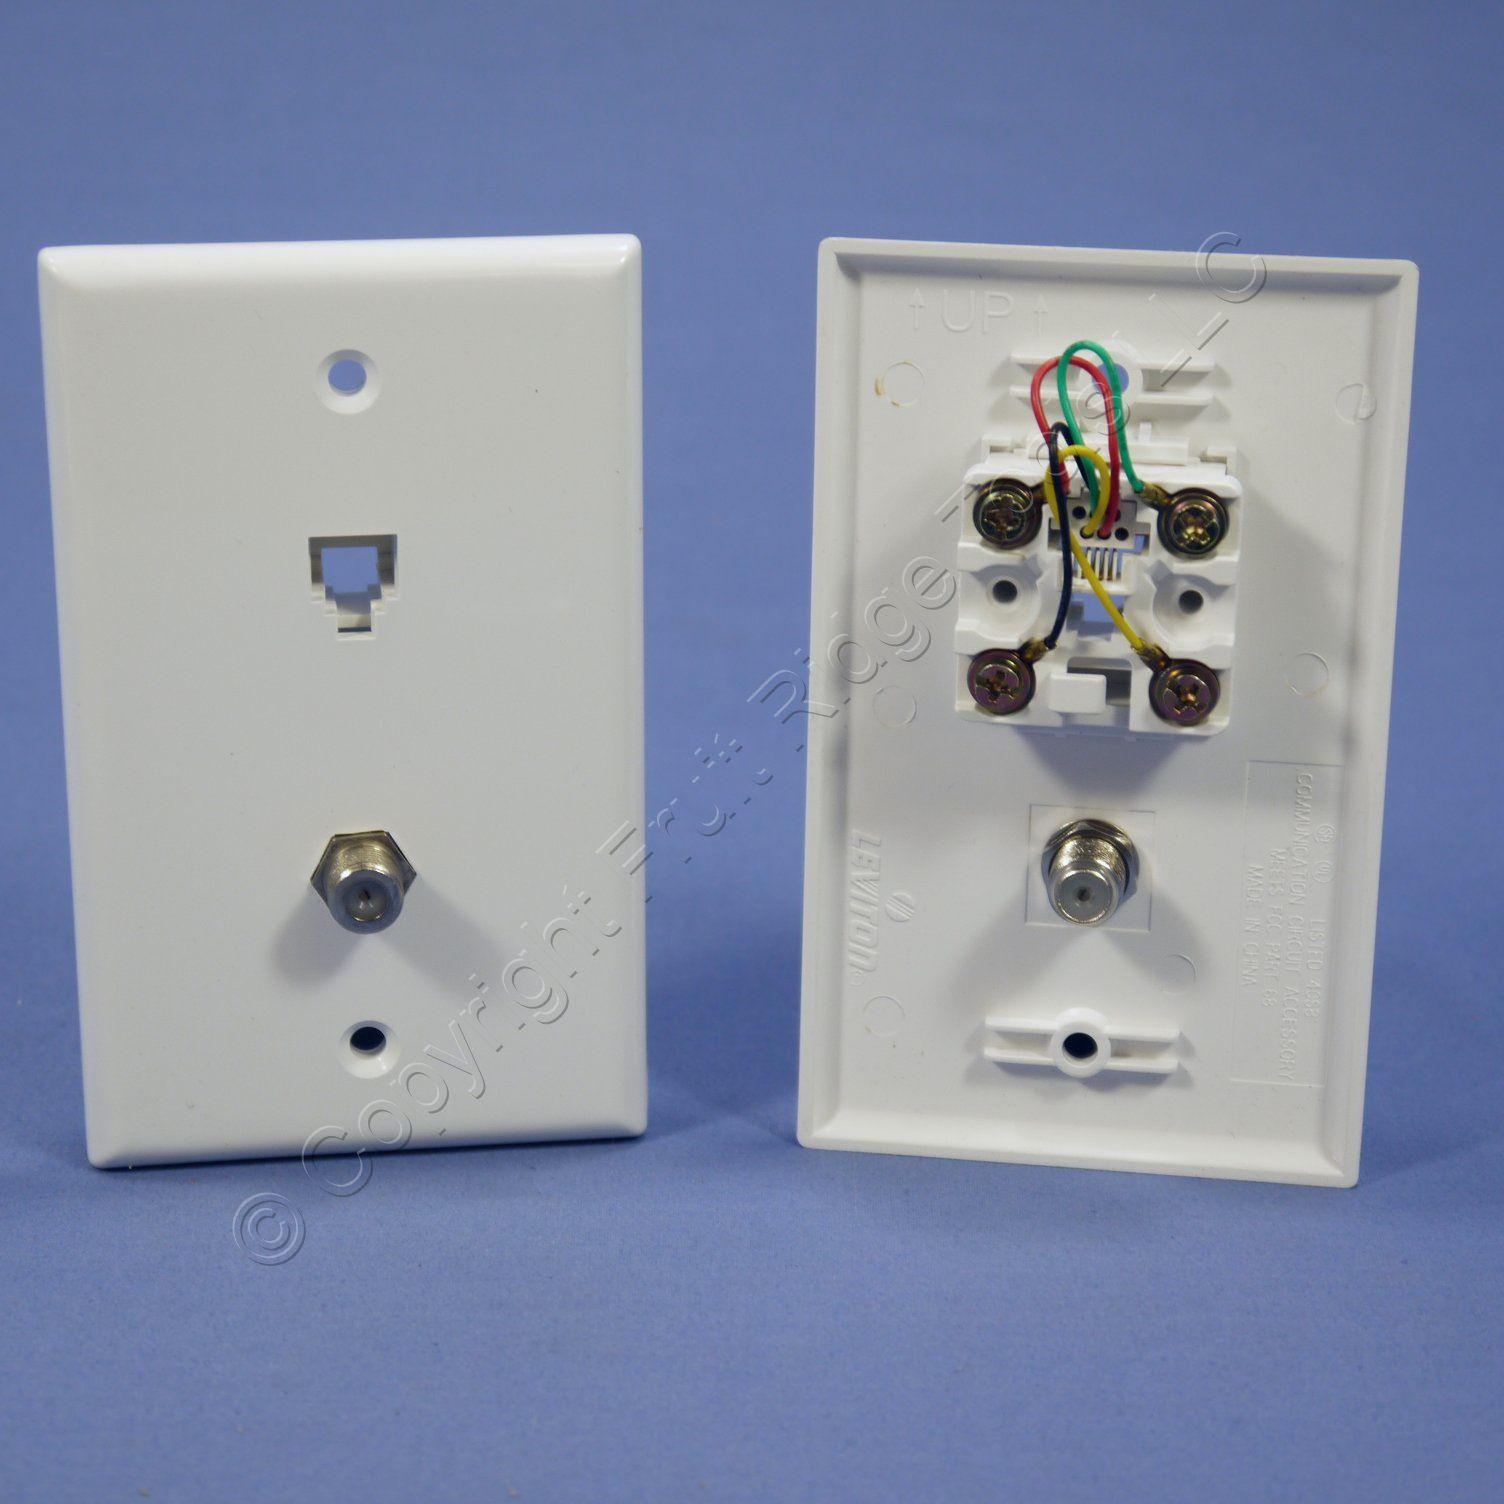 Leviton Gfci Wiring Instructions